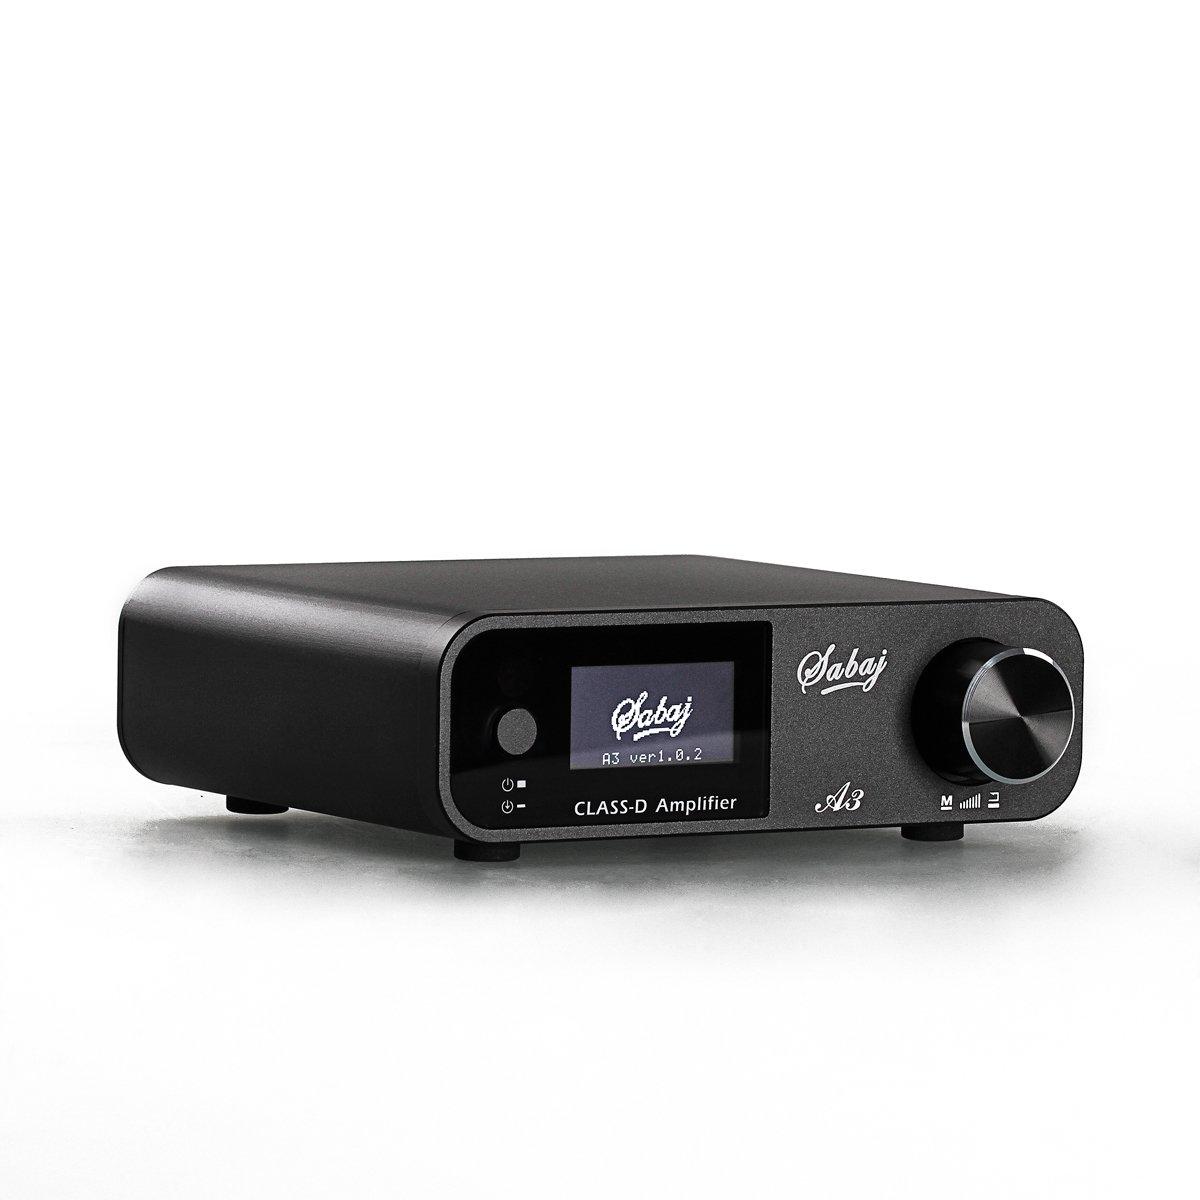 Sabaj A3 80Wx2 Amplificadores Est/éreo Hifi Bluetooth 4.2 AMP USB DSP para Equipos de Audio